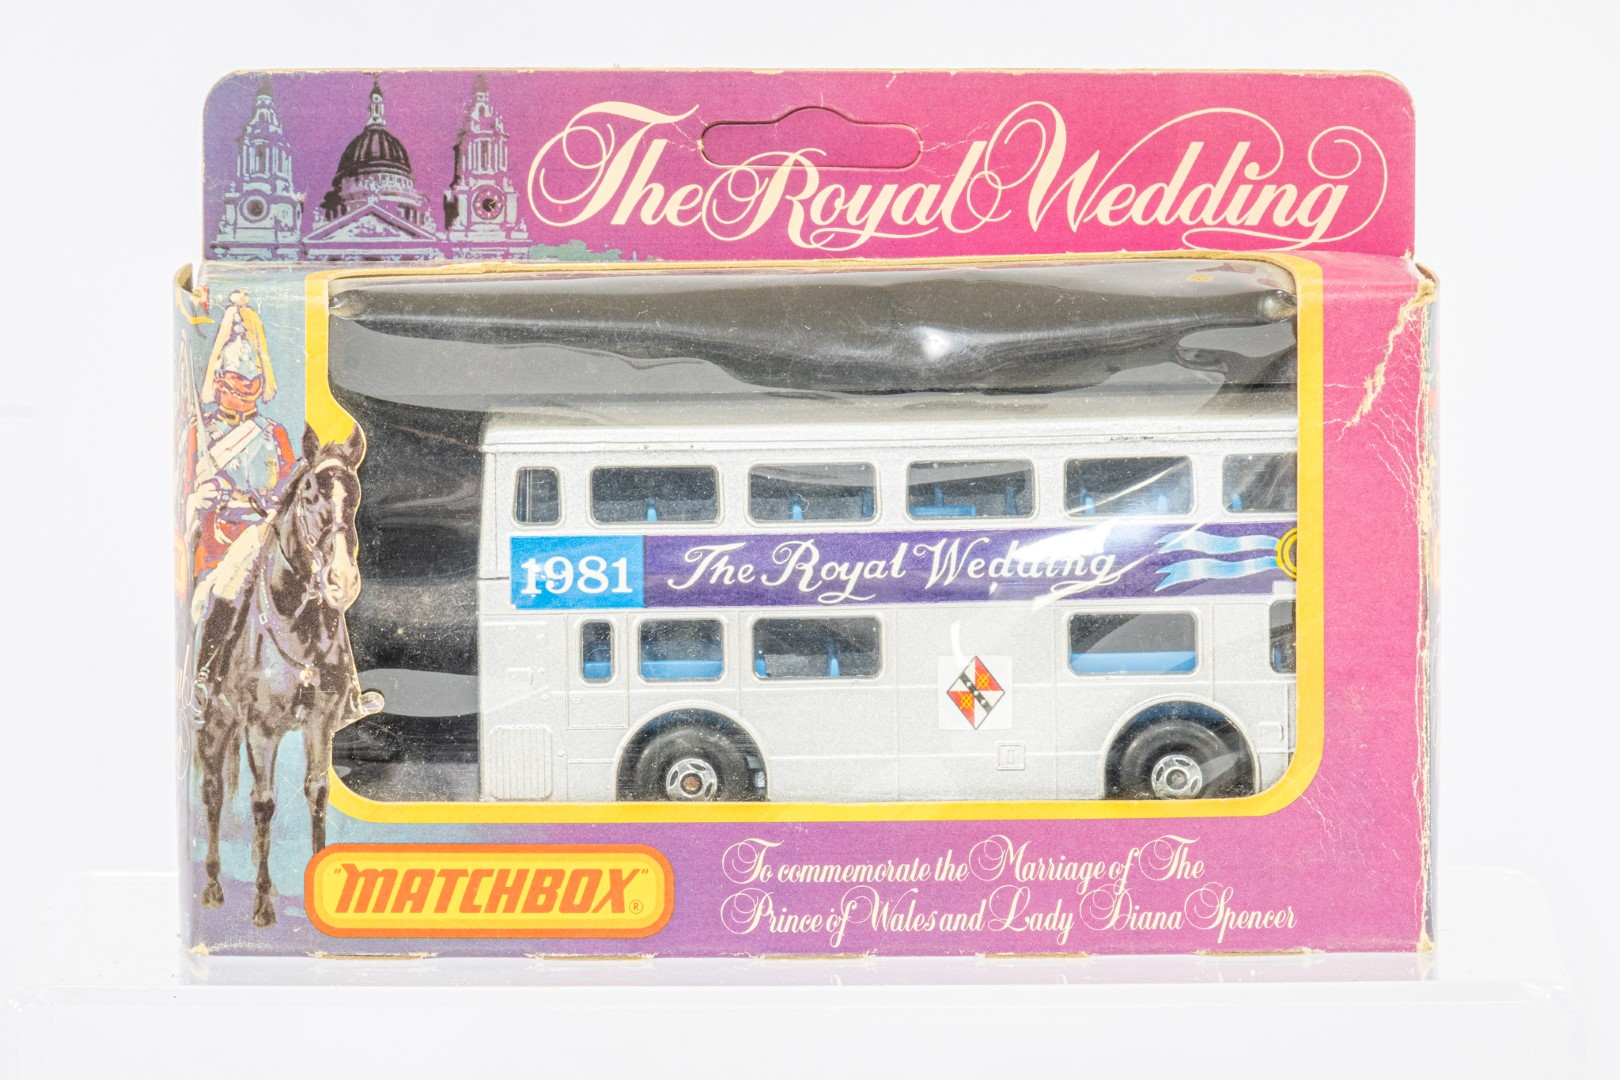 2 x bus models - Corgi OM44117 London 2012 & Matchbox KRW-15 The Royal Wedding - Image 3 of 3